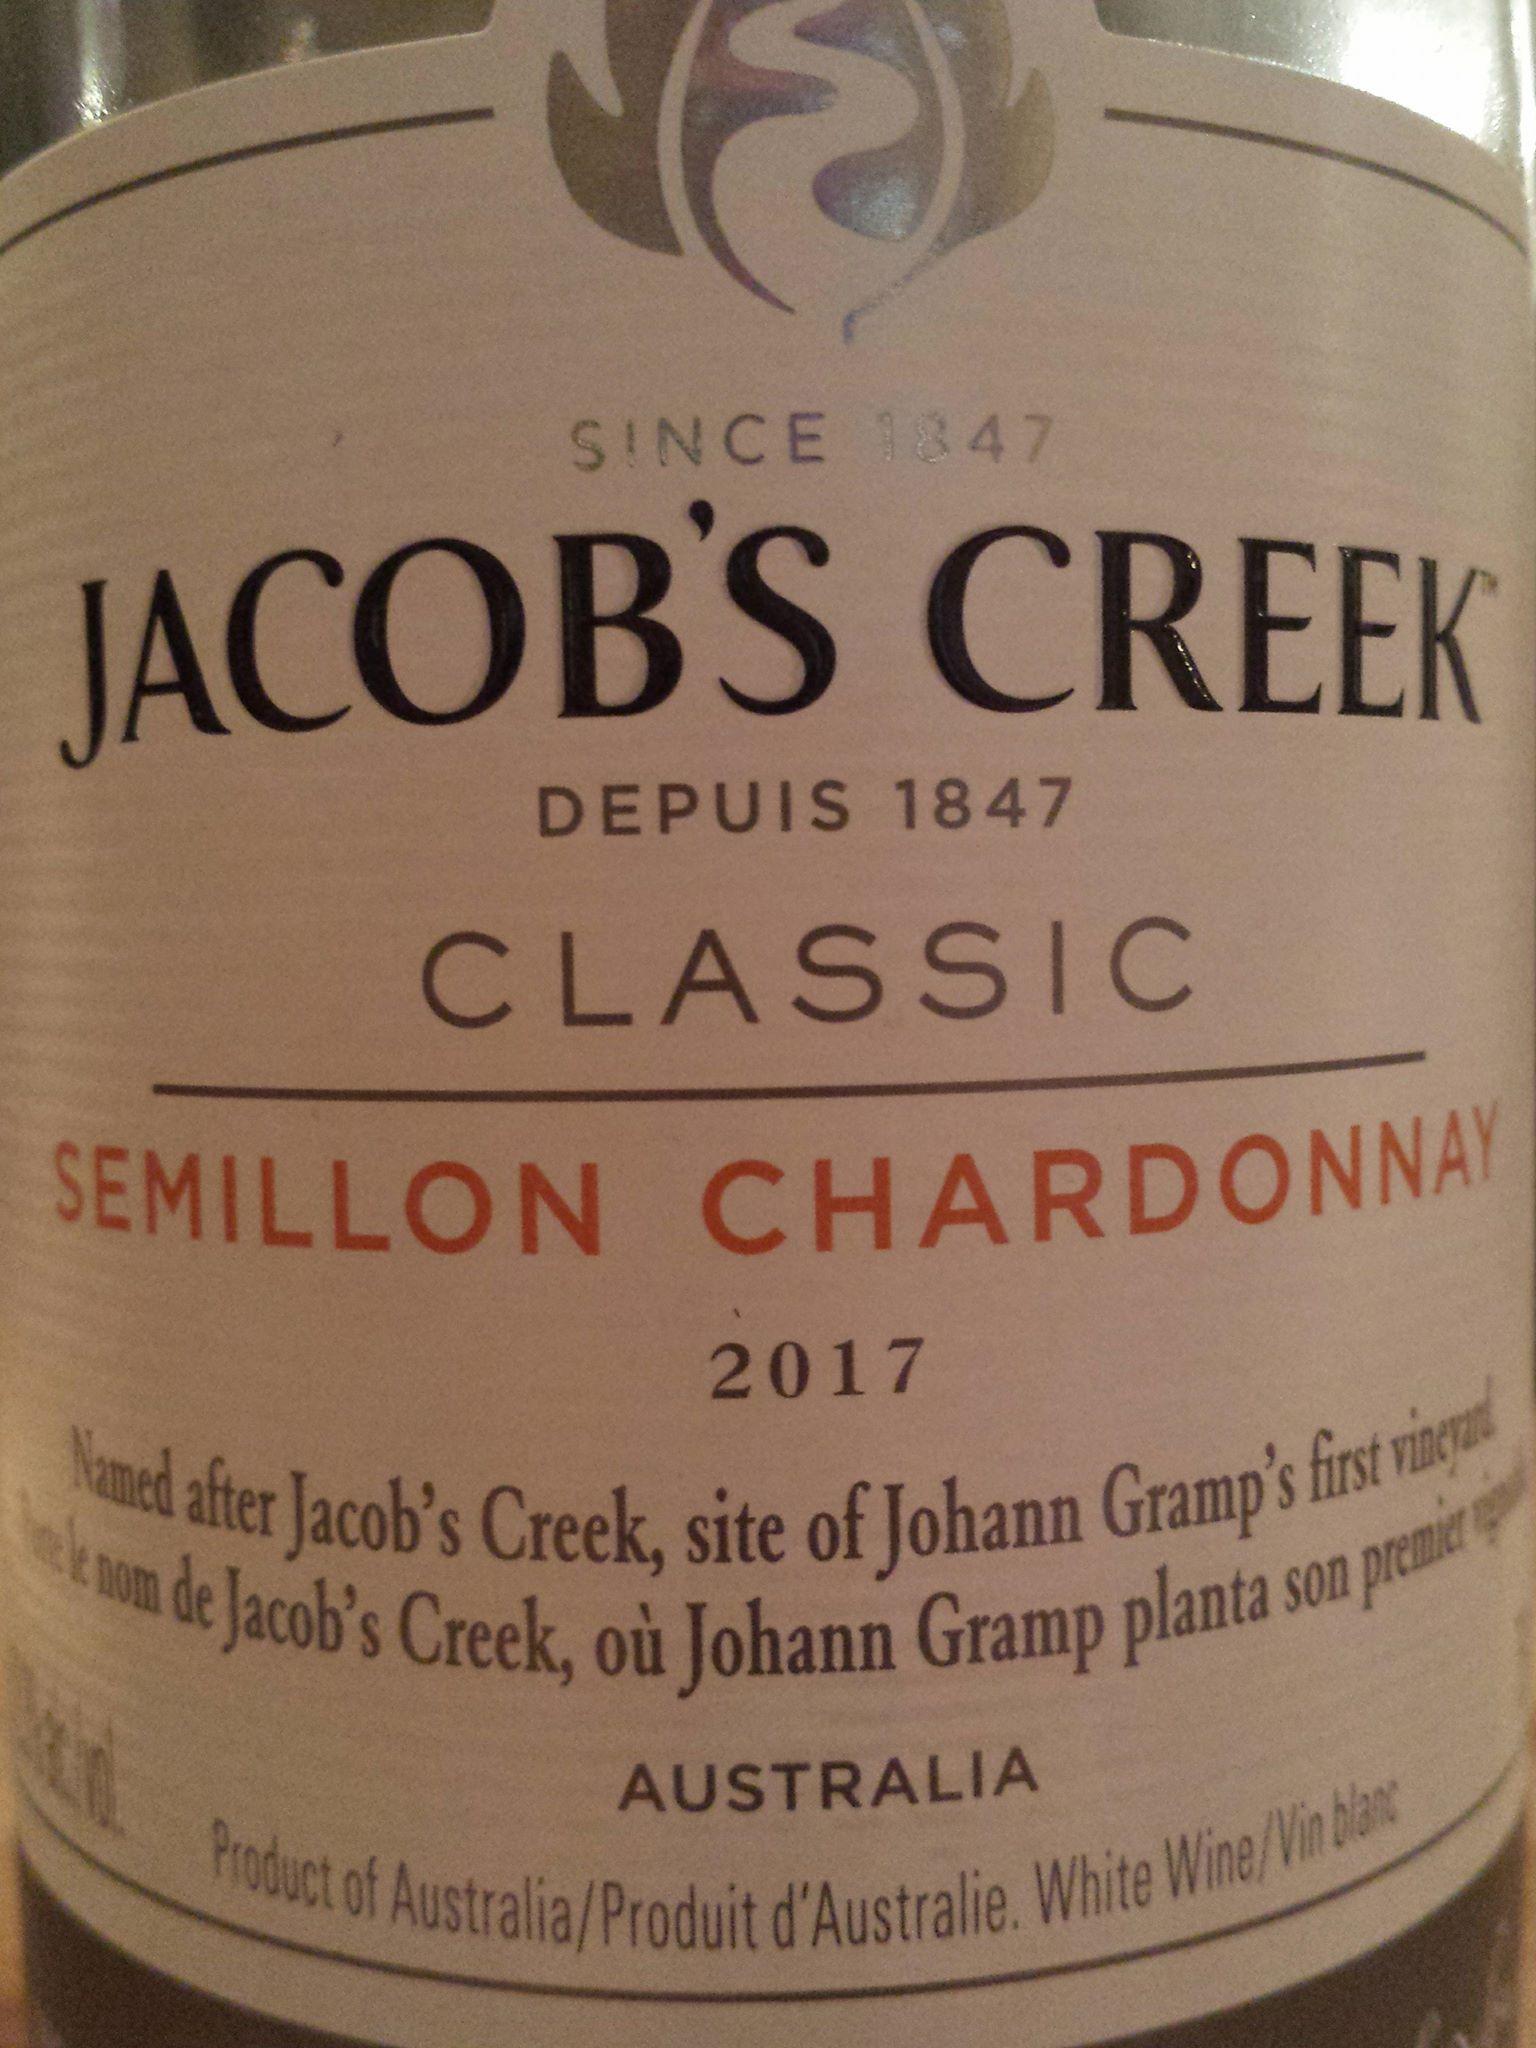 Jacob's Creek Classic Semillon Chardonnay 2017